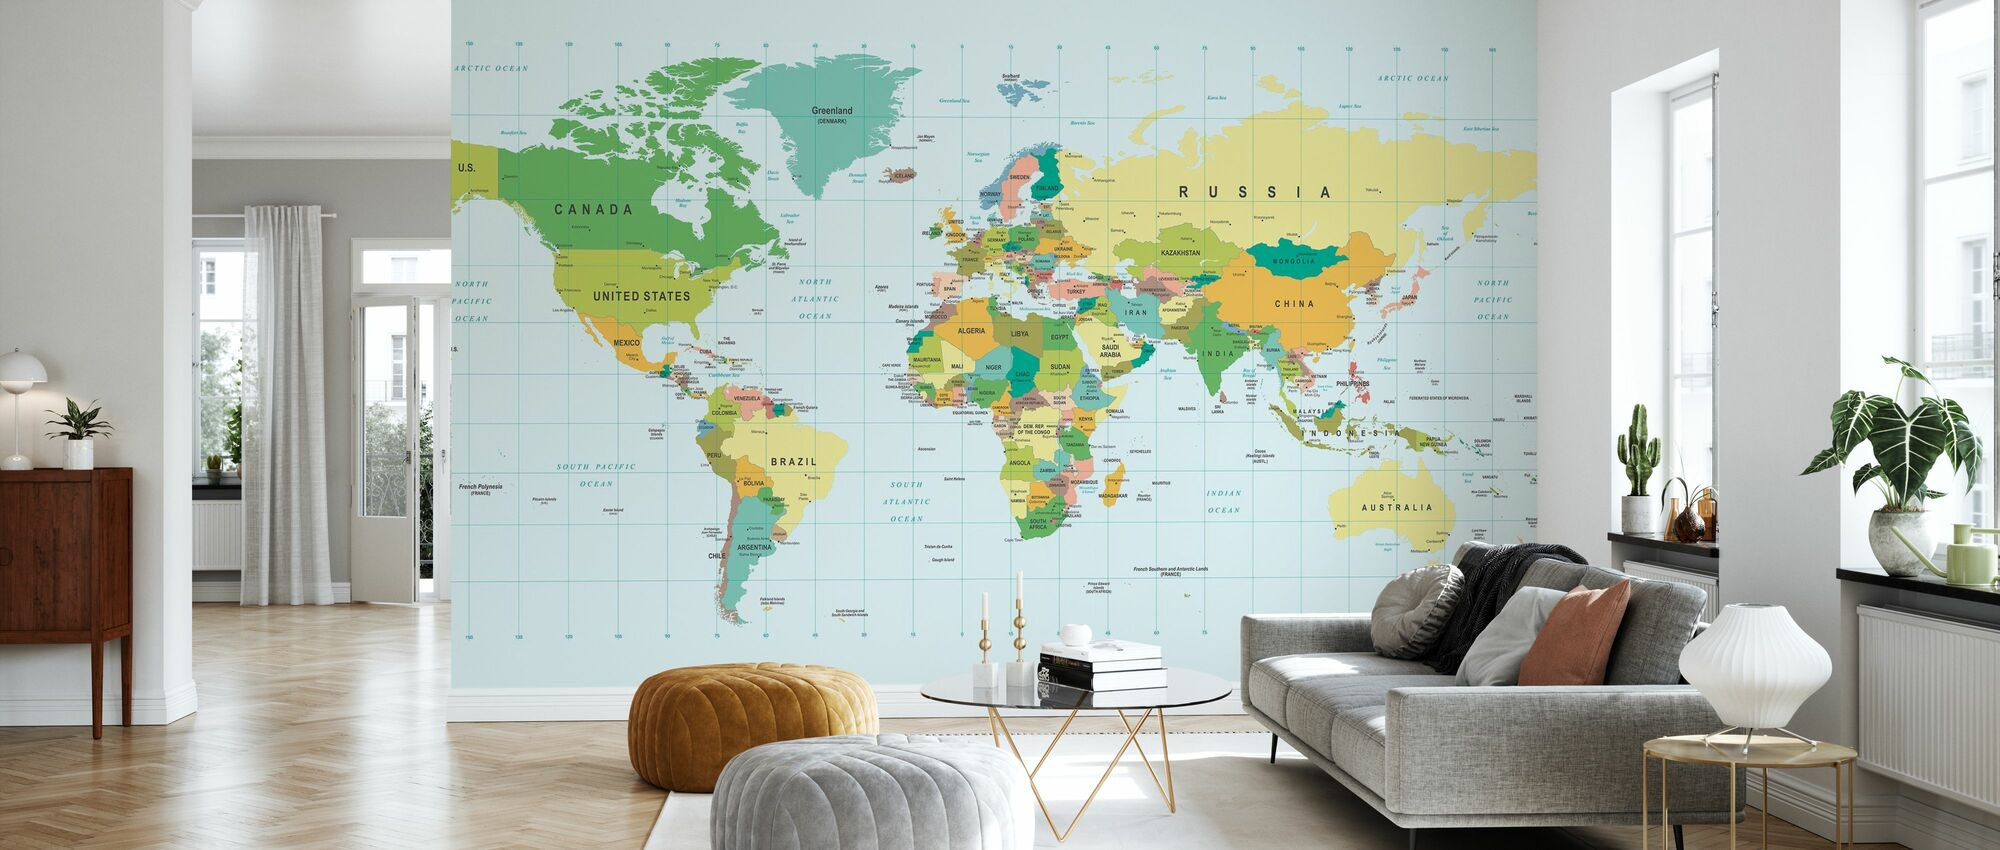 Political World Map - Wallpaper - Living Room